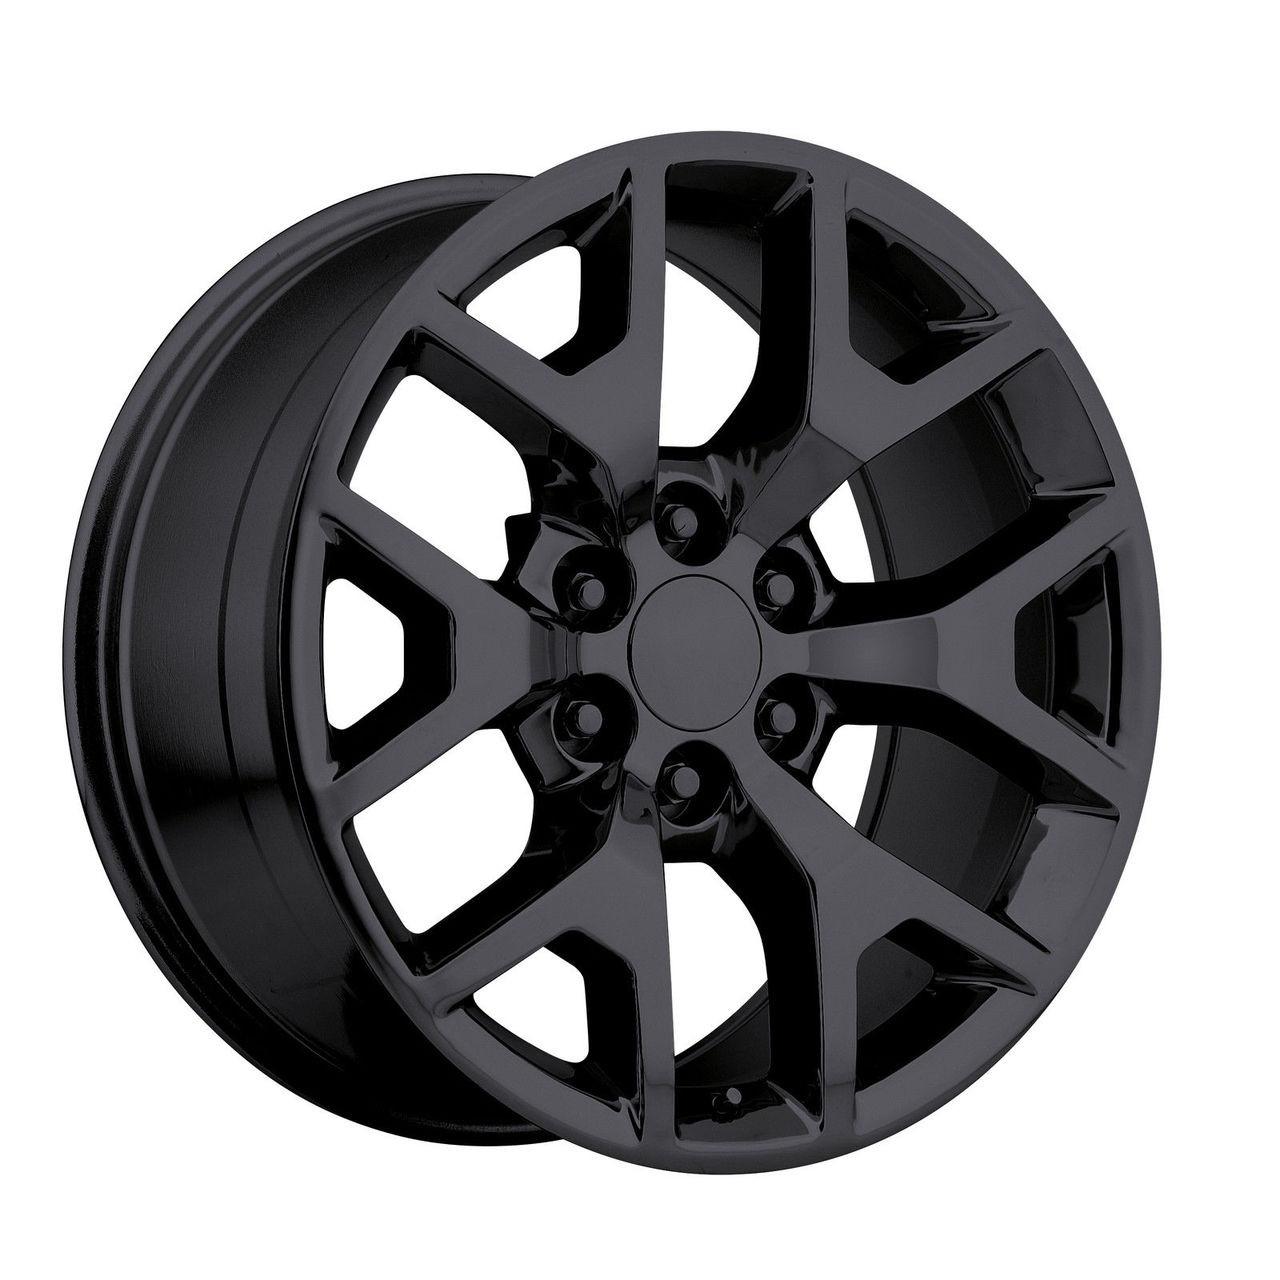 "20"" 2014 GMC Sierra Chevy 1500 Silverado Replica Wheels ..."